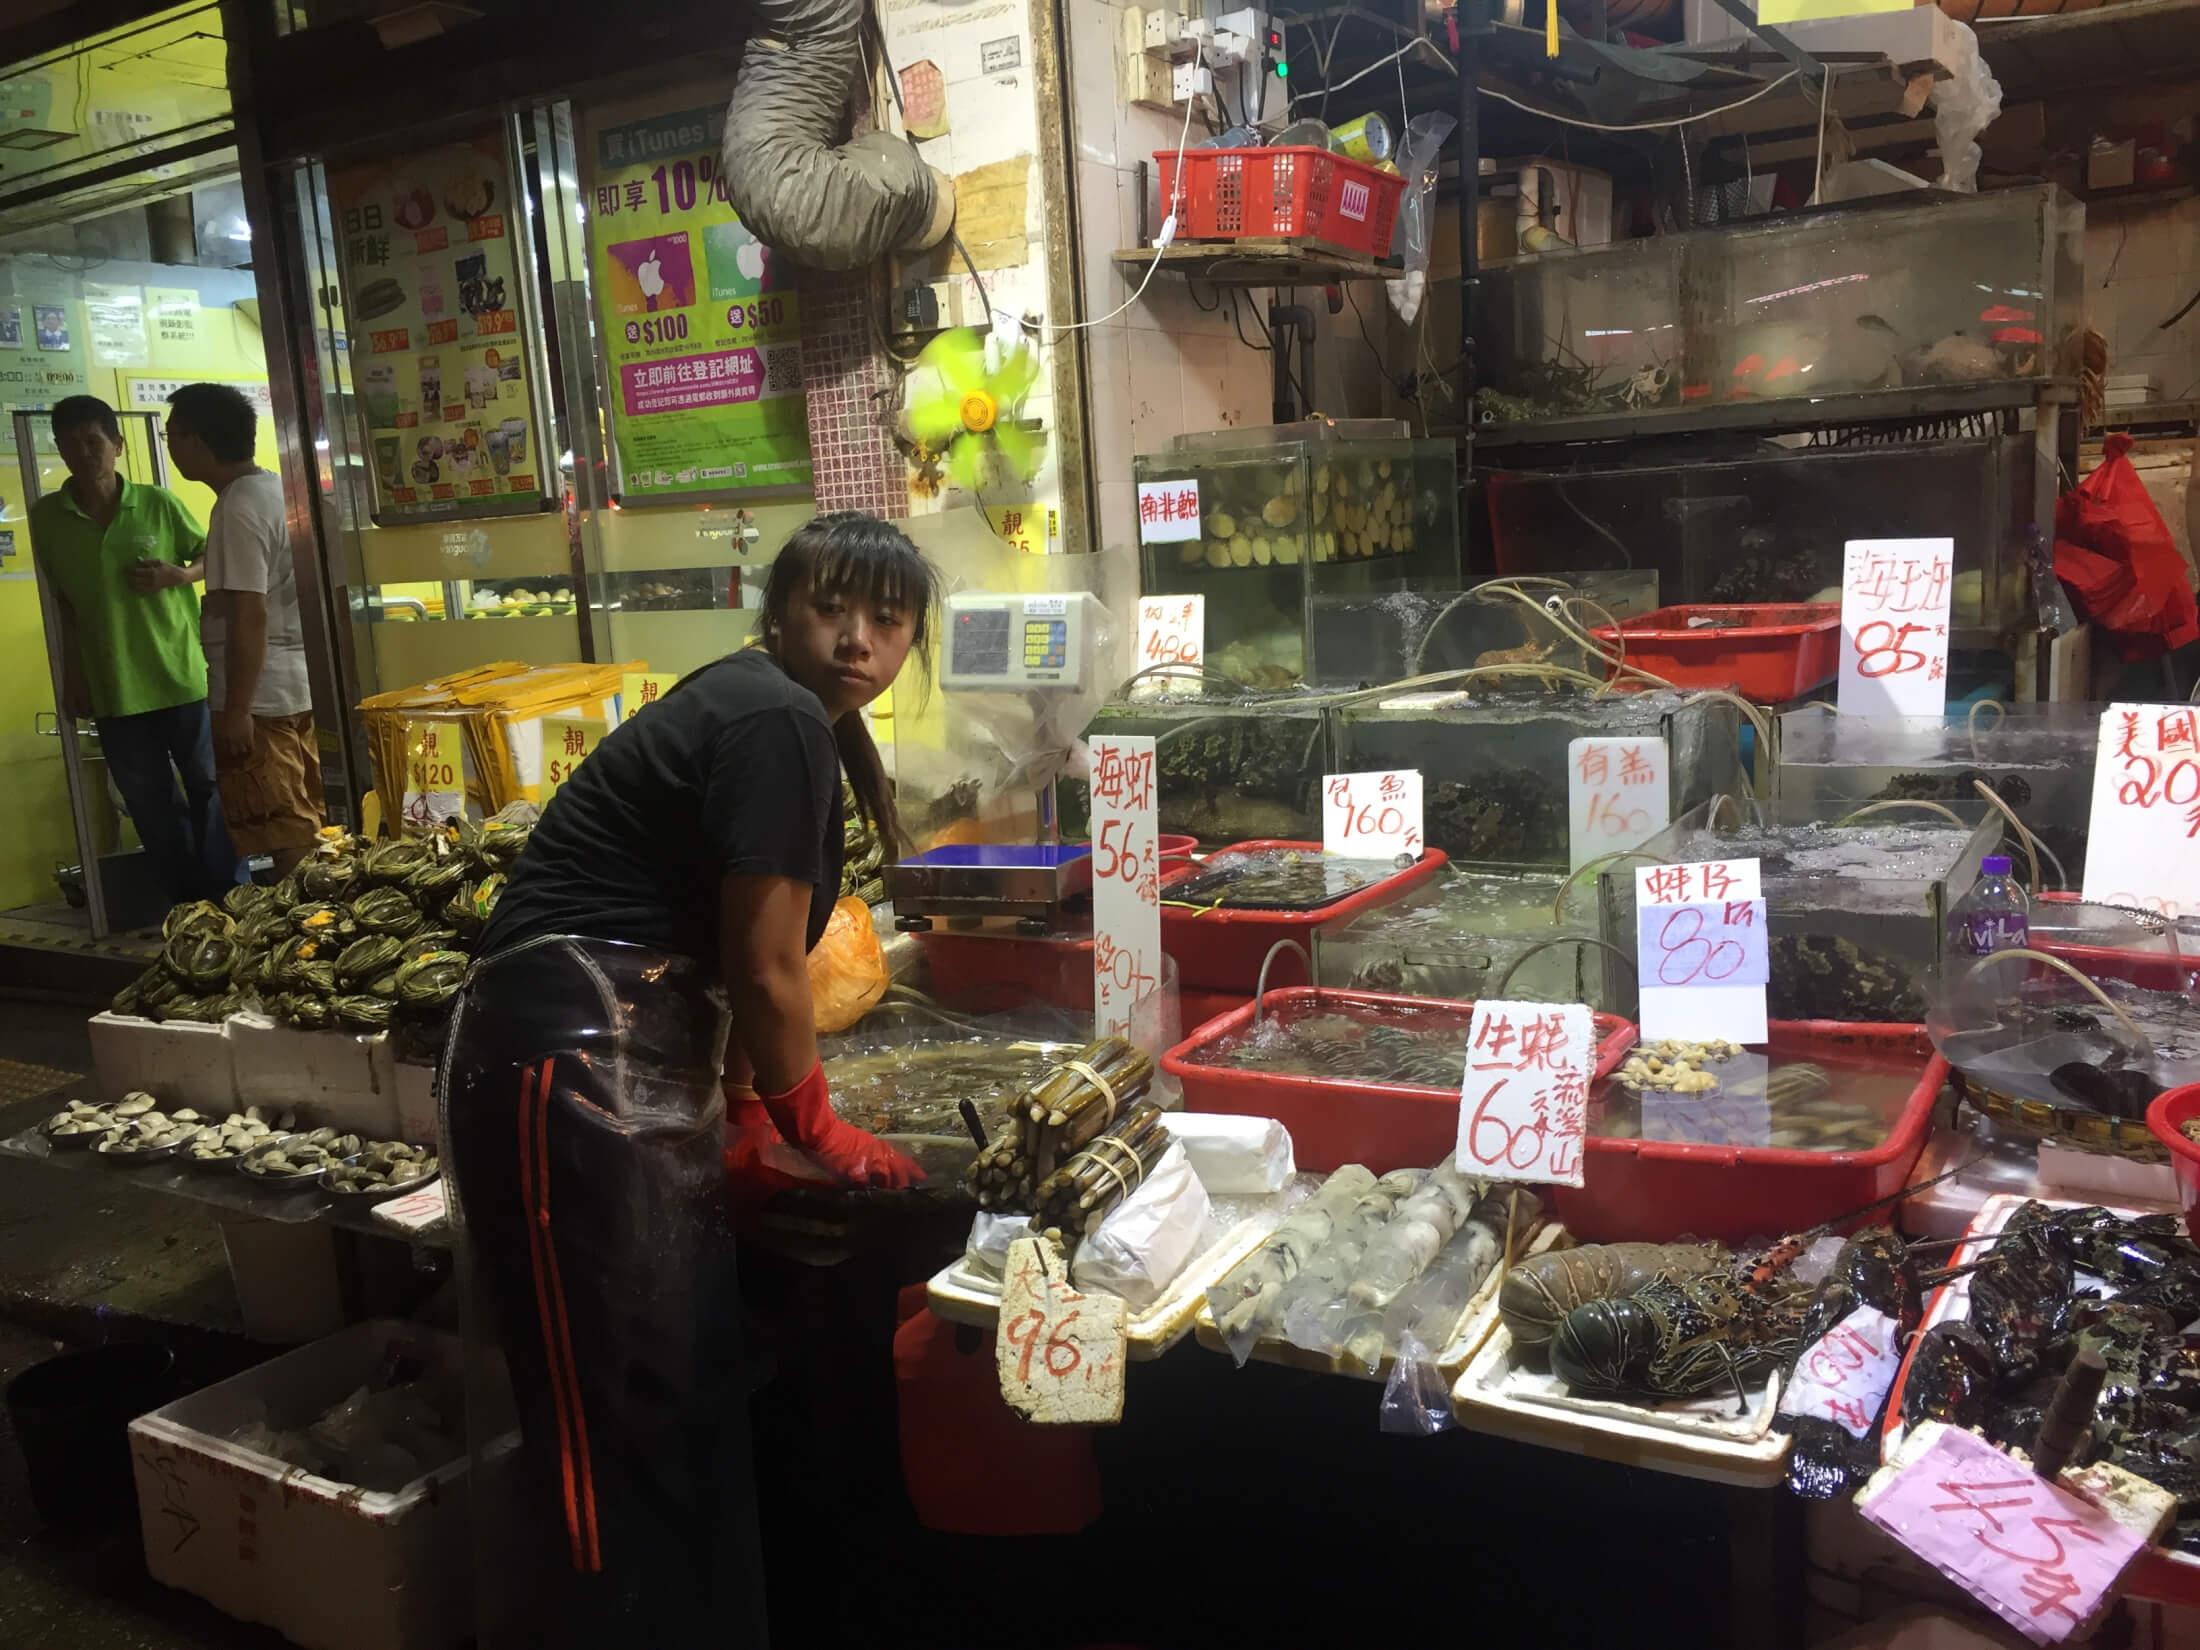 hongkong food markt essen strassenmarkt